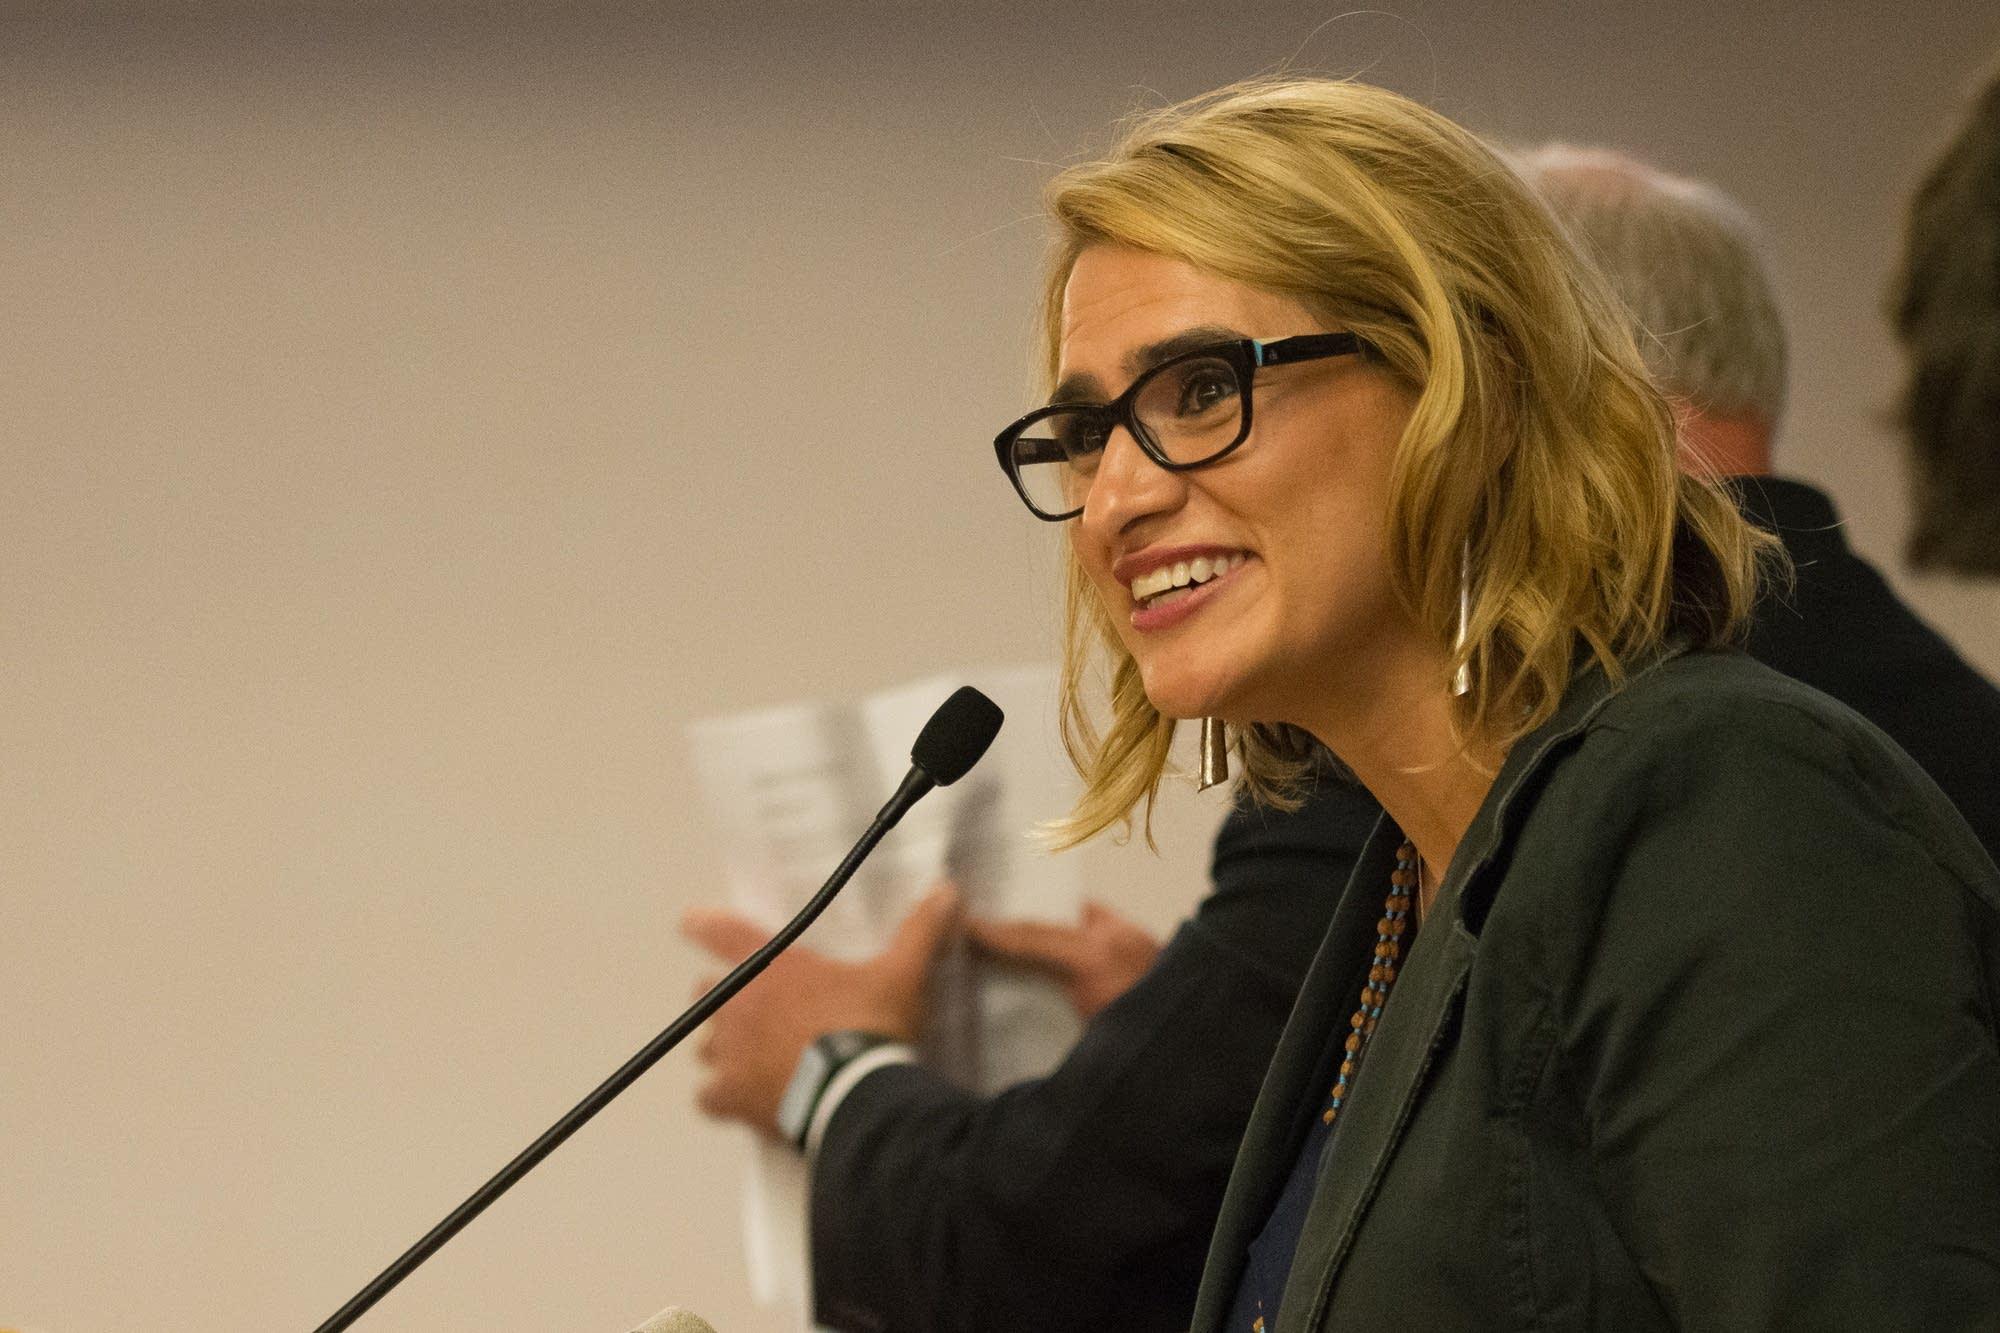 Peggy Flanagan, Walz' running mate, gives a victory speech.